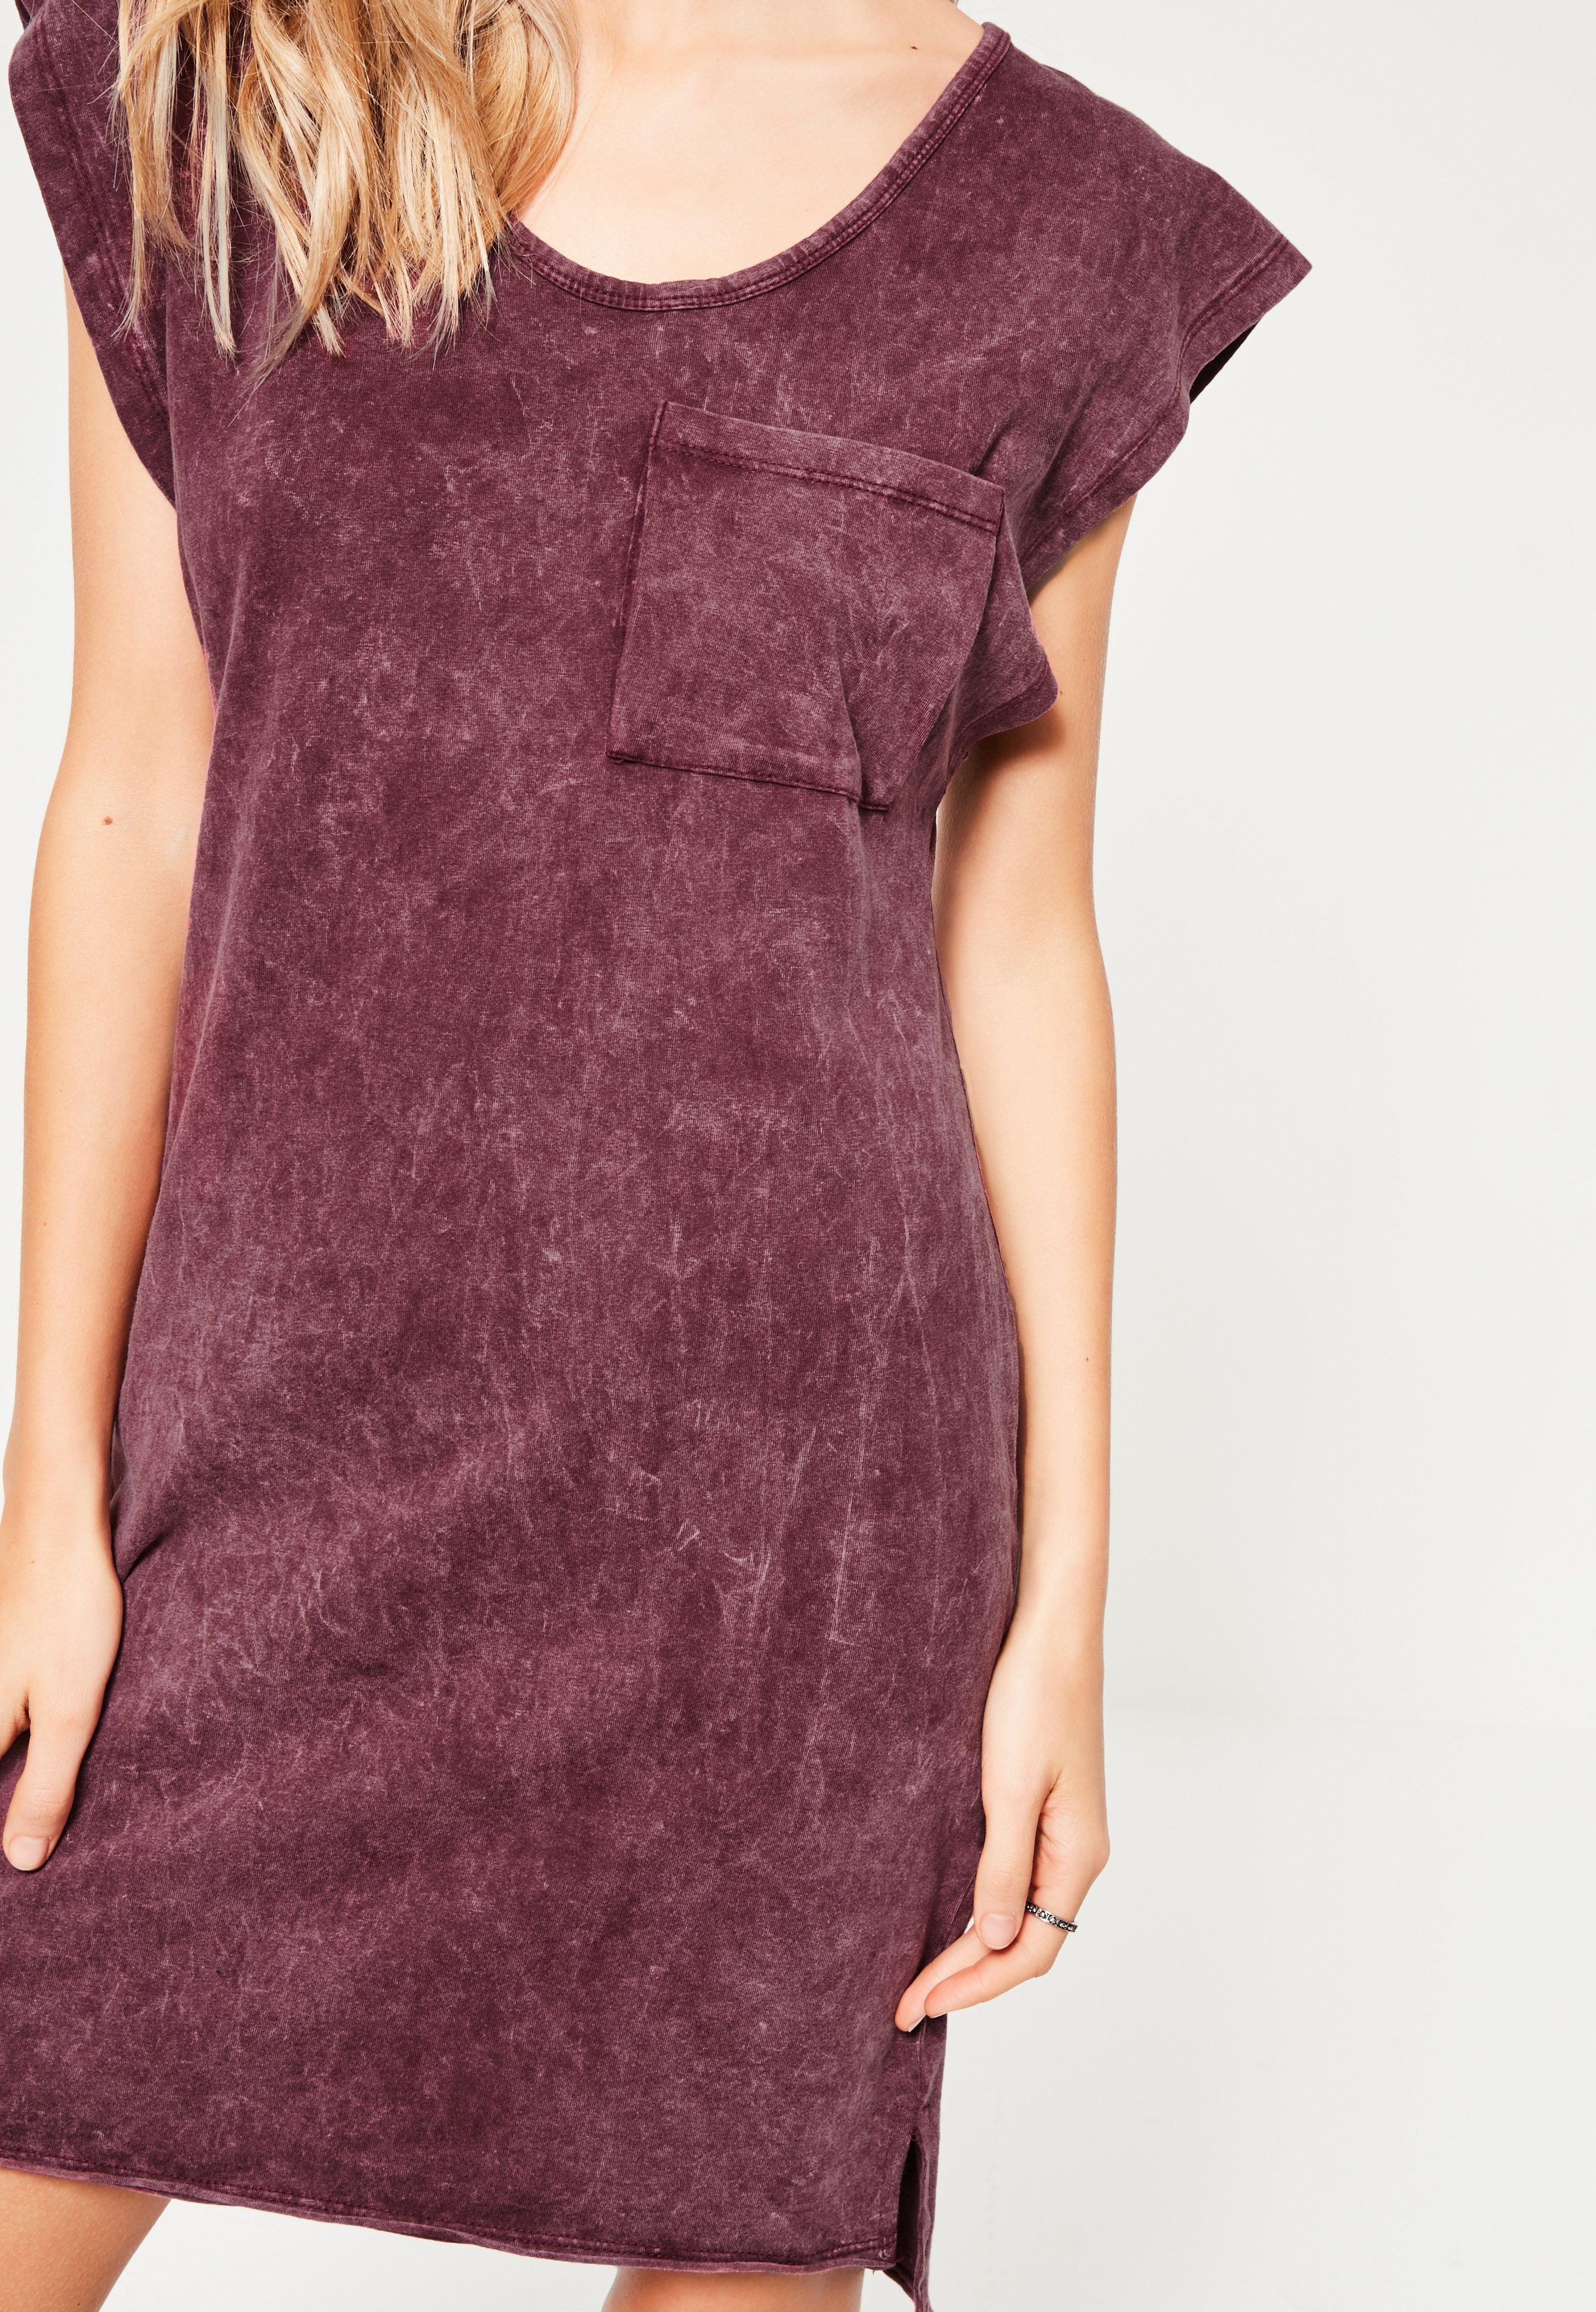 Burgundy Wash Pocket Oversized Dress